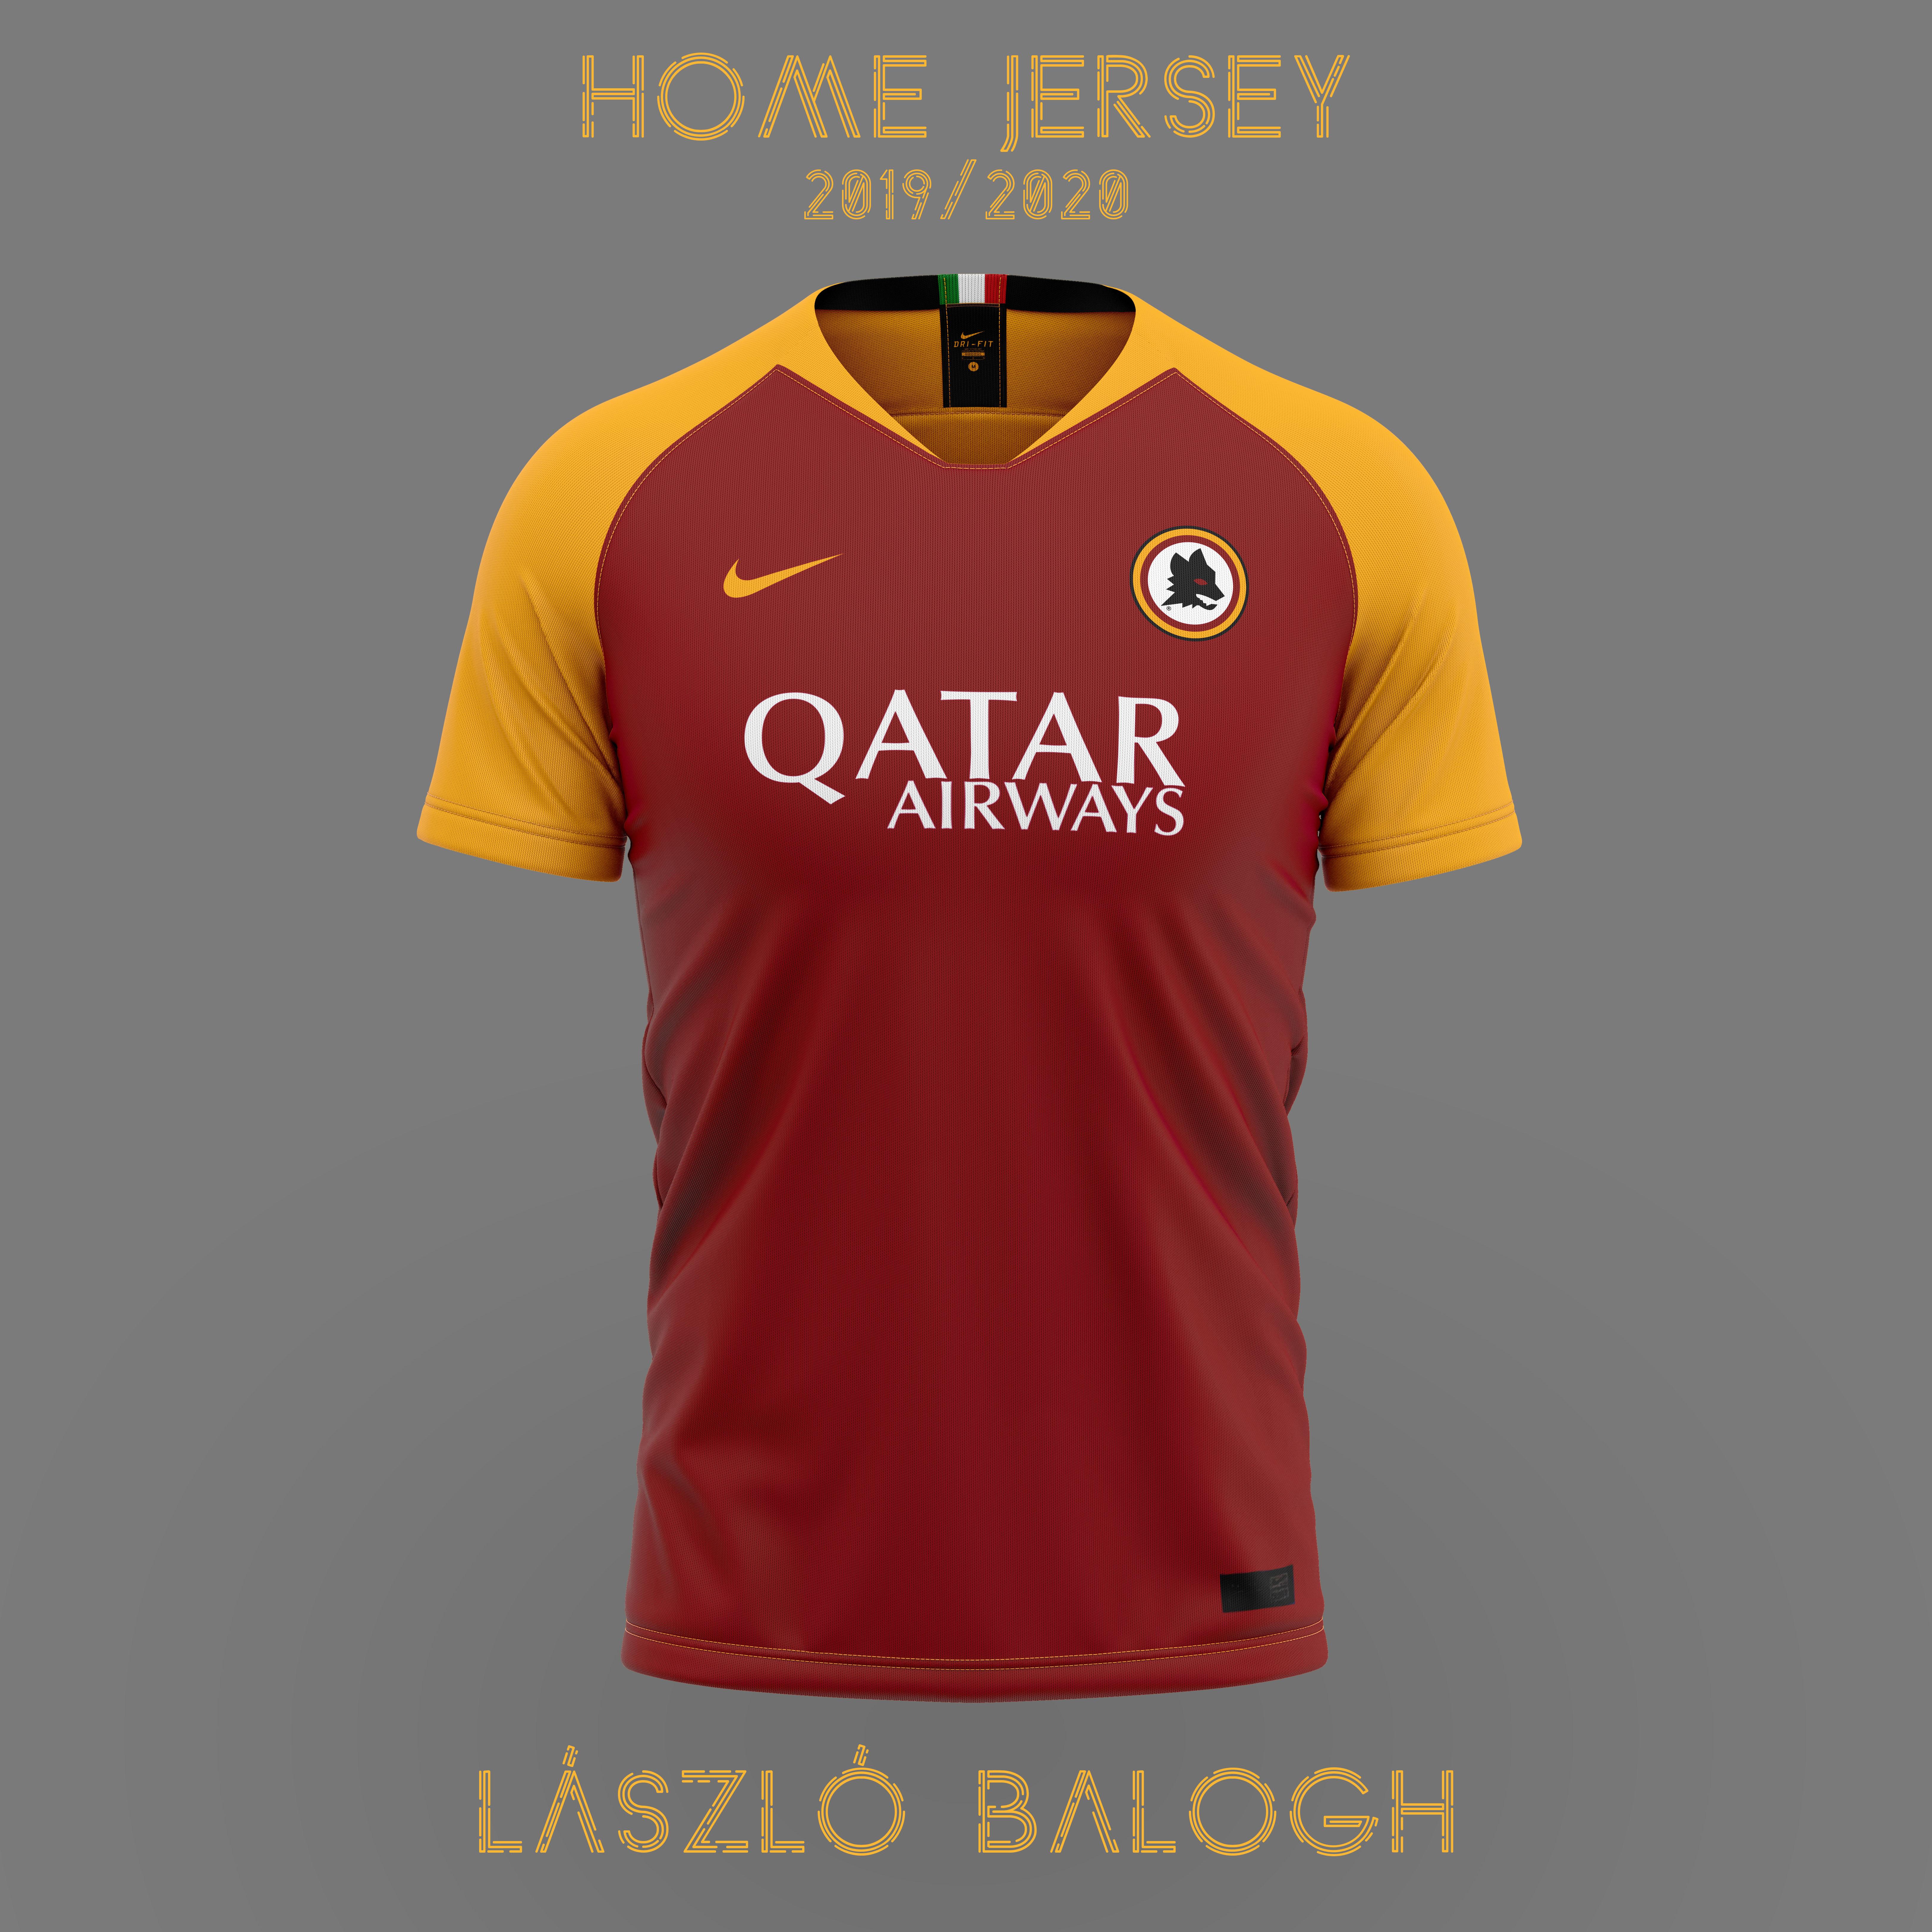 buy online fe031 e768c AS Roma 2019/2020 Home Jersey Concept